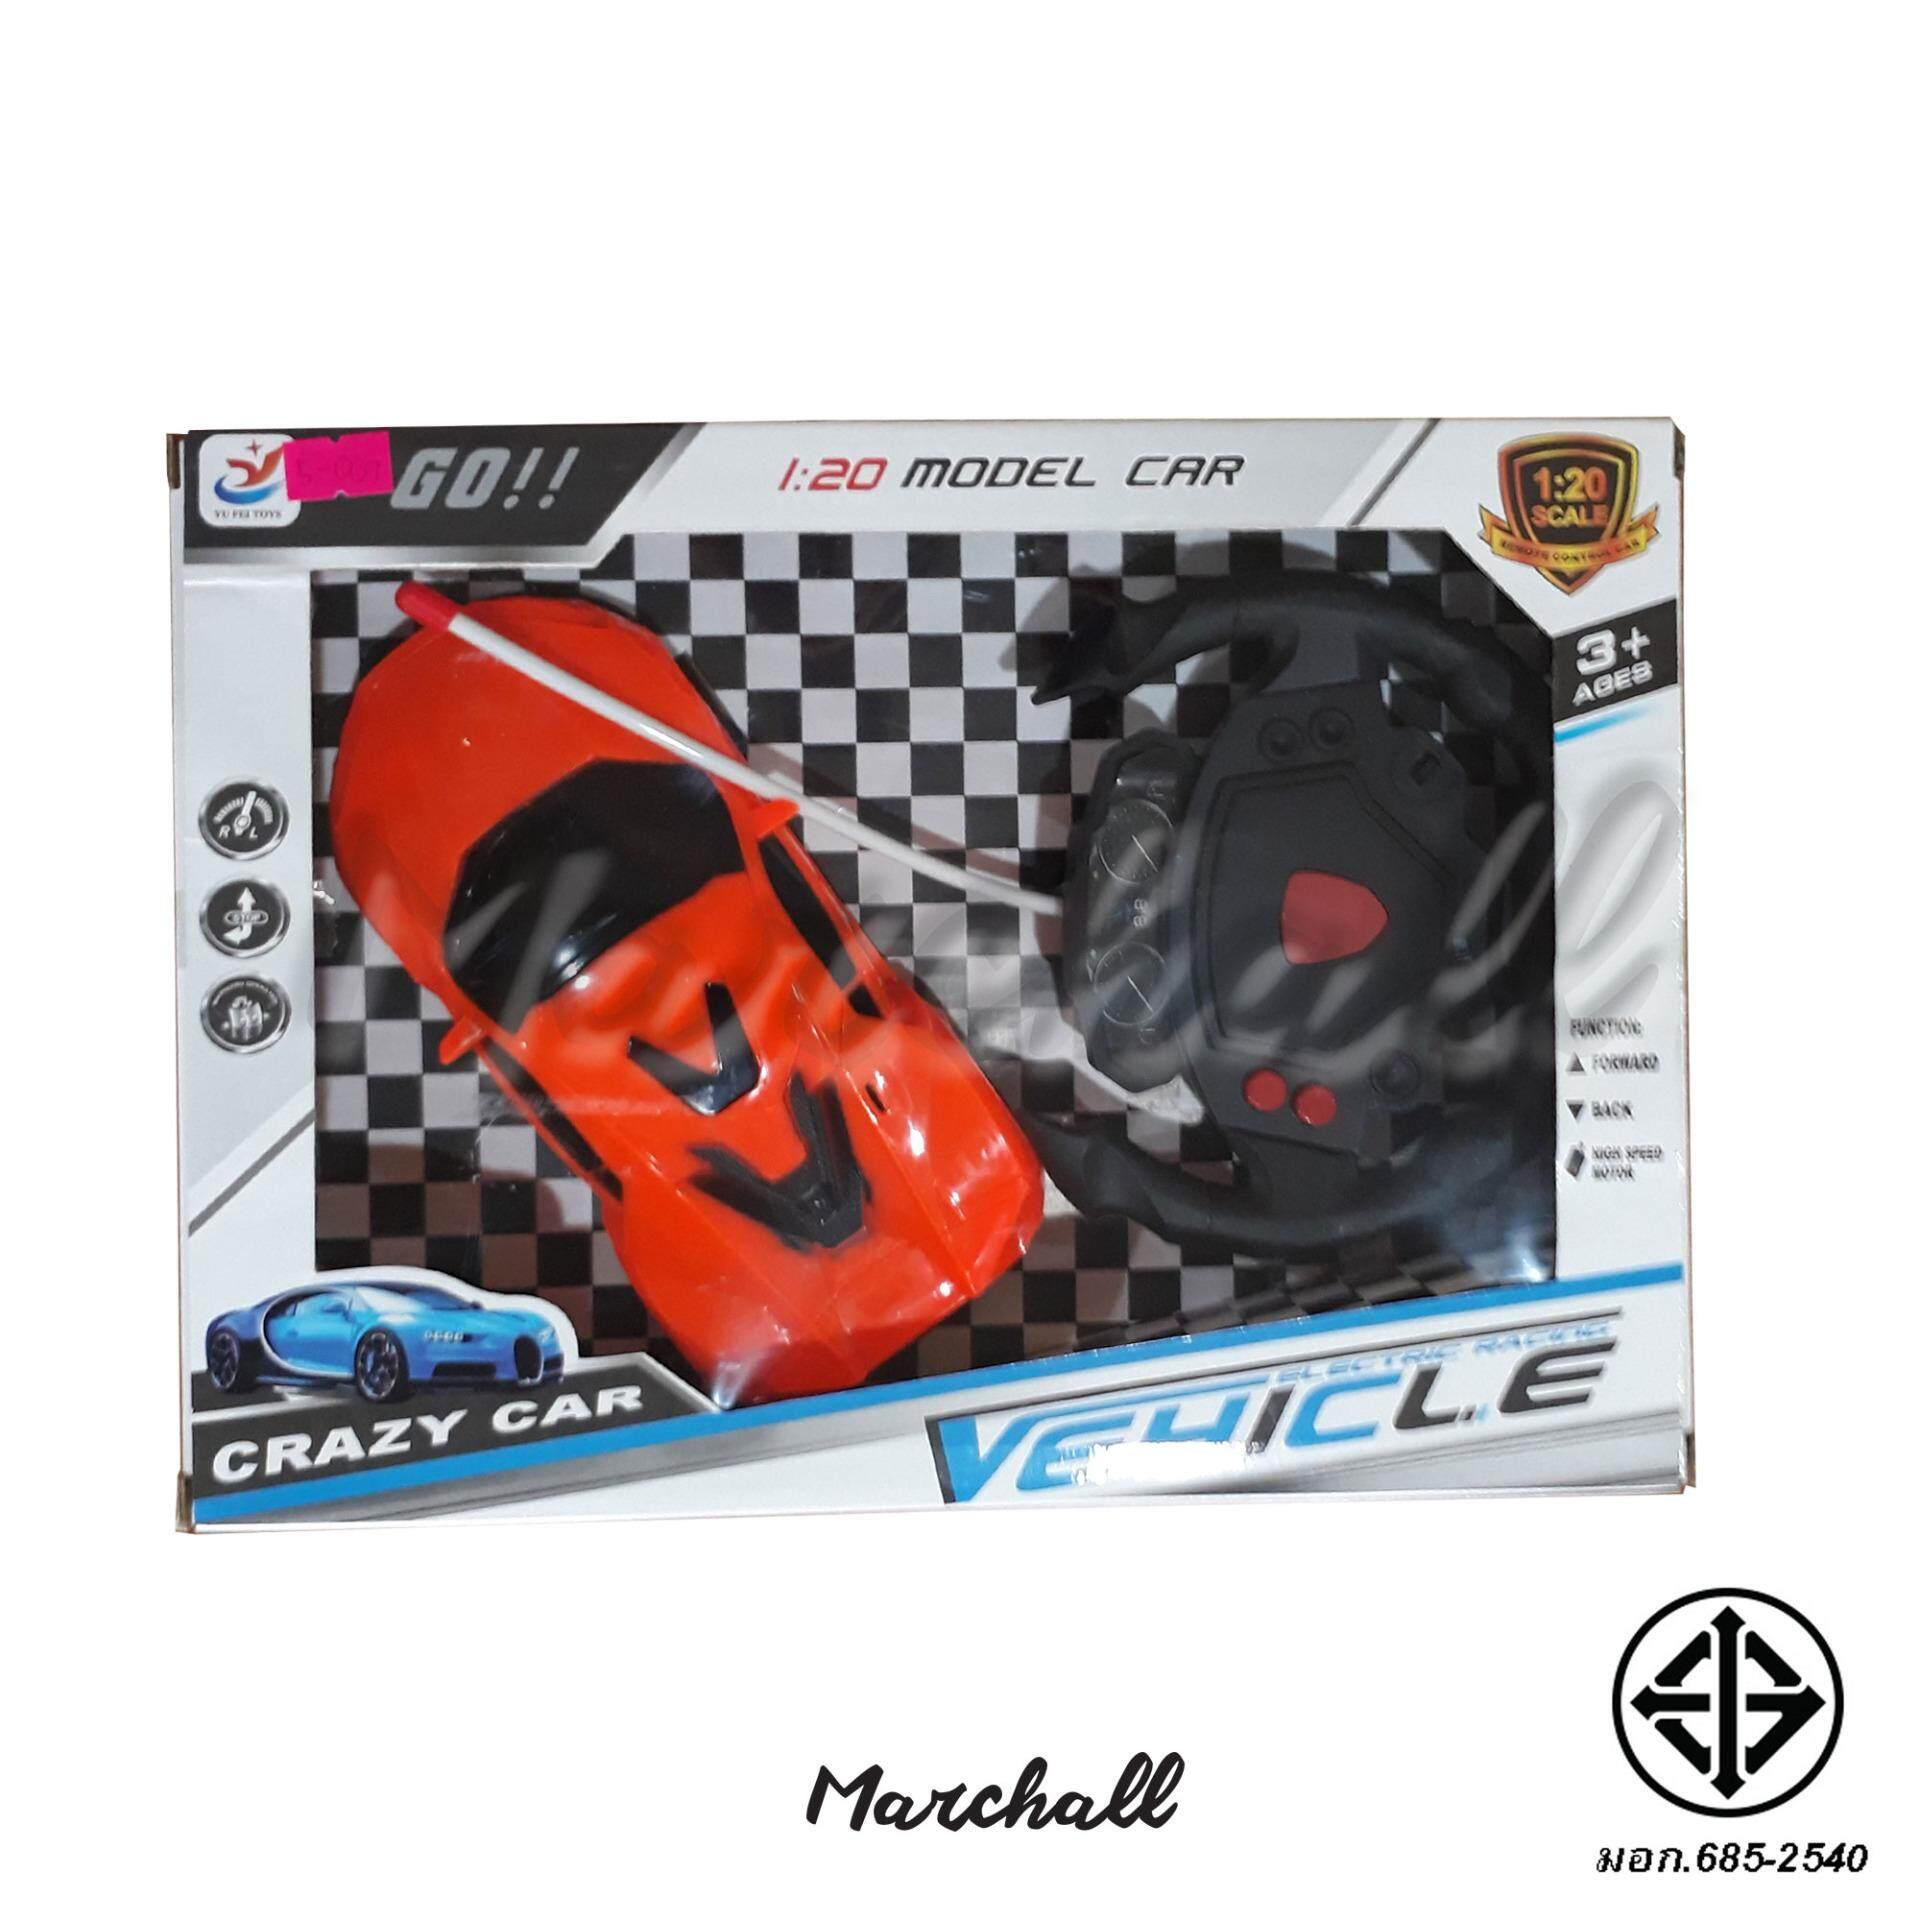 Toys 5007o รถสปอร์ต บังคับ สีส้ม Crazy Car มี รีโมทคอนโทรล วัสดุปลอดภัย มี มอก. ของเล่น Venicle Electric Racing สร้างเสริมจินตนาการ The Best Gifts For Children Funny Toy Knead Your Interesting Childhood Its A Magical World Lets Play Together By Marchall.